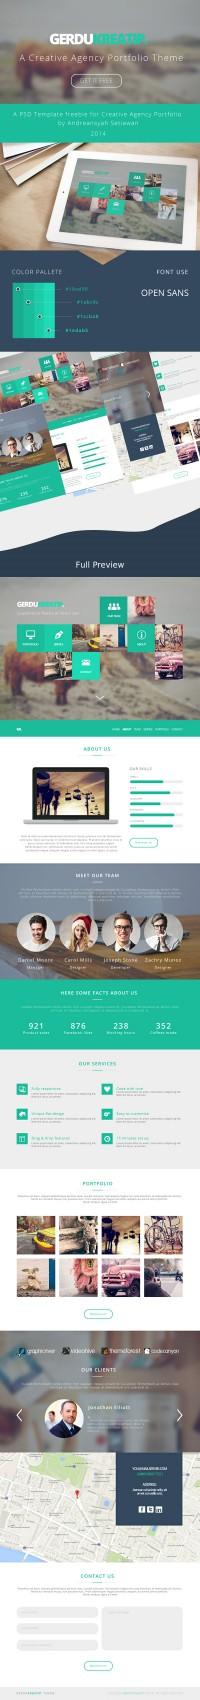 GerduKreatip: Agency Portfolio Theme | GraphicBurger | Inspiration DE